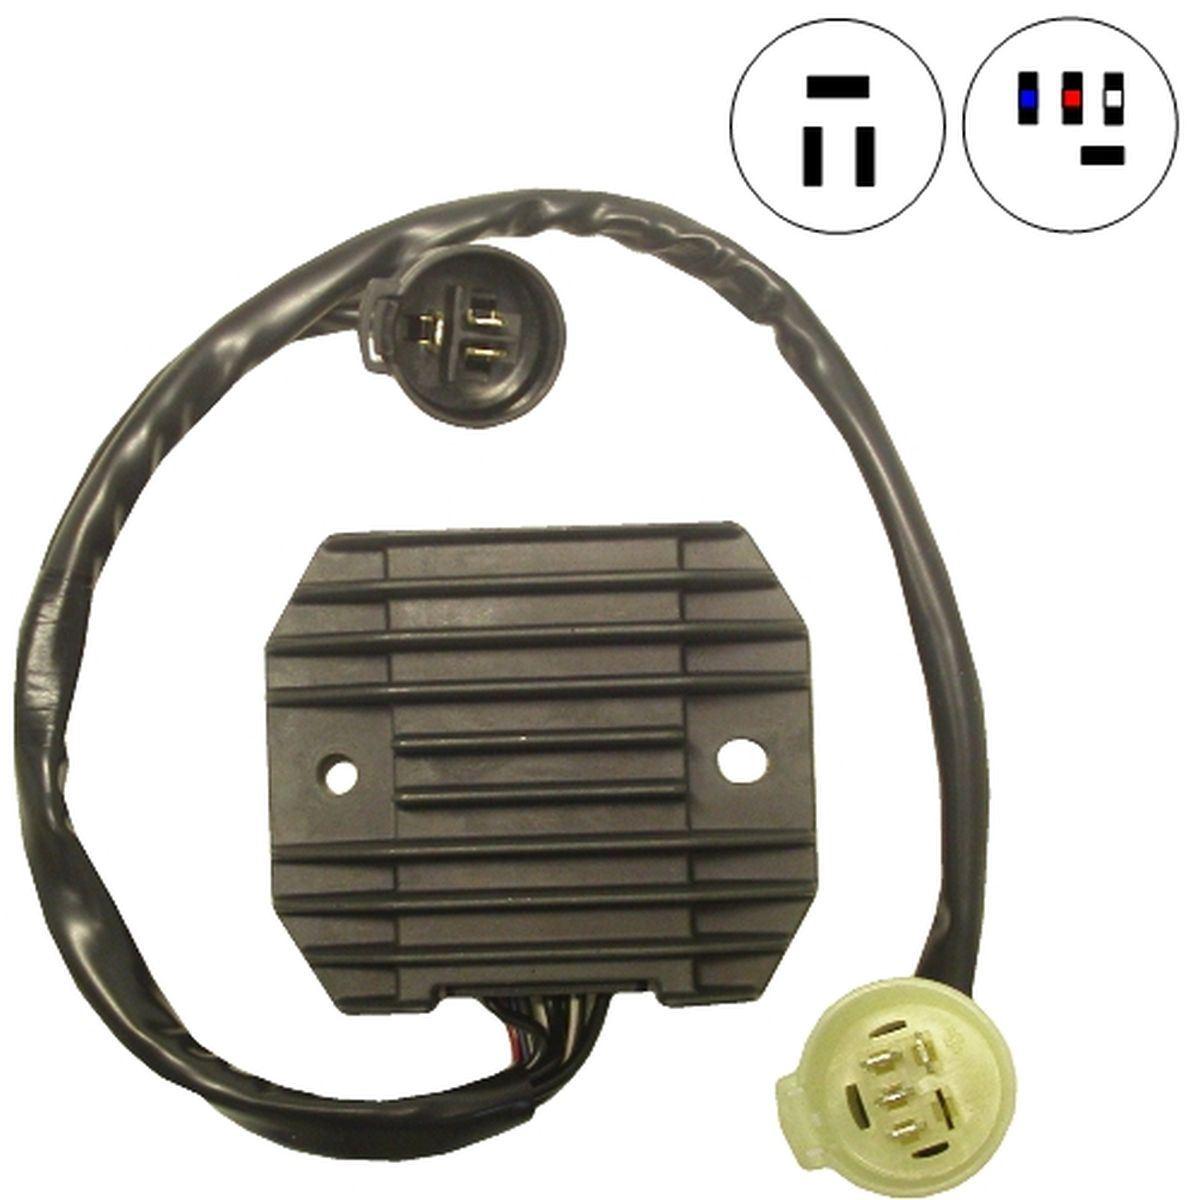 Kawasaki 636 Rectifier Regulator Wiring Connections Diagrams Zx6r Diagram 2007 2003 Zx9r W800